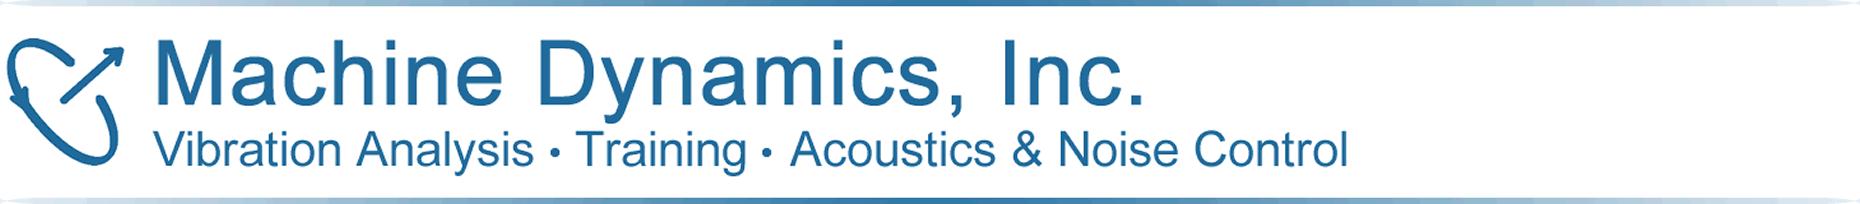 Machine Dynamics, Vibration Analysis, Dynamic Field and Shop